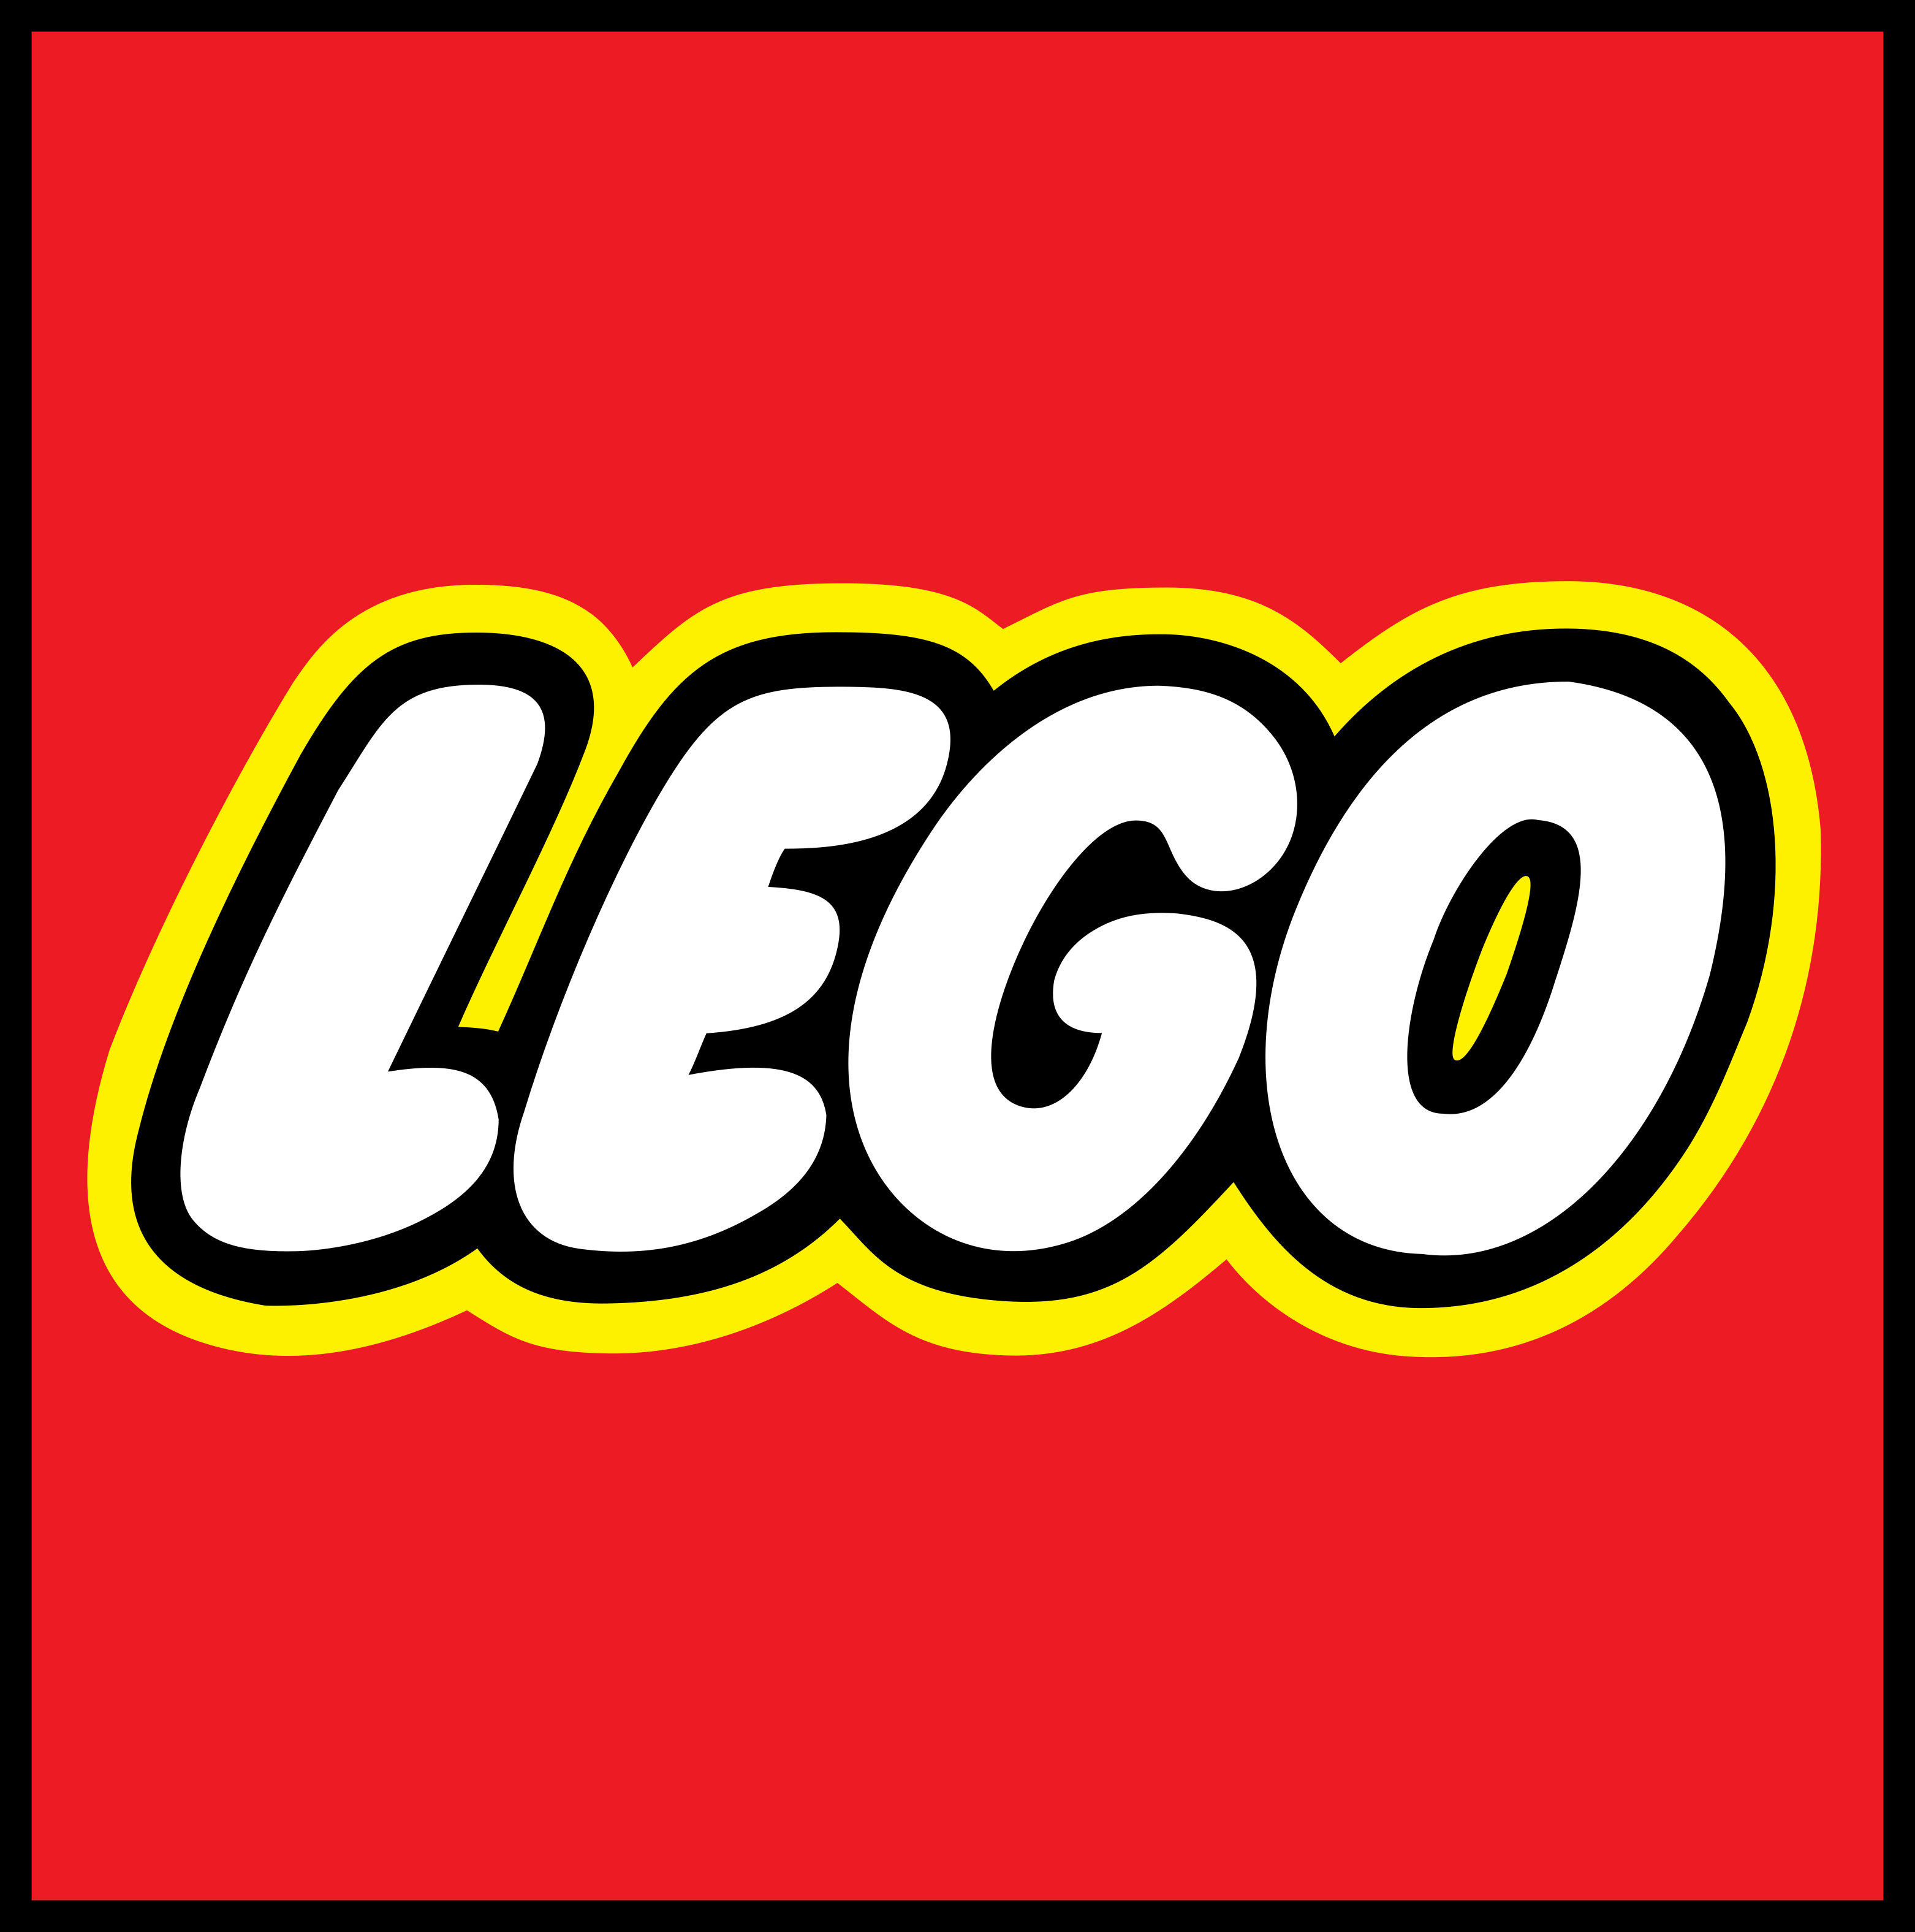 1973 logo